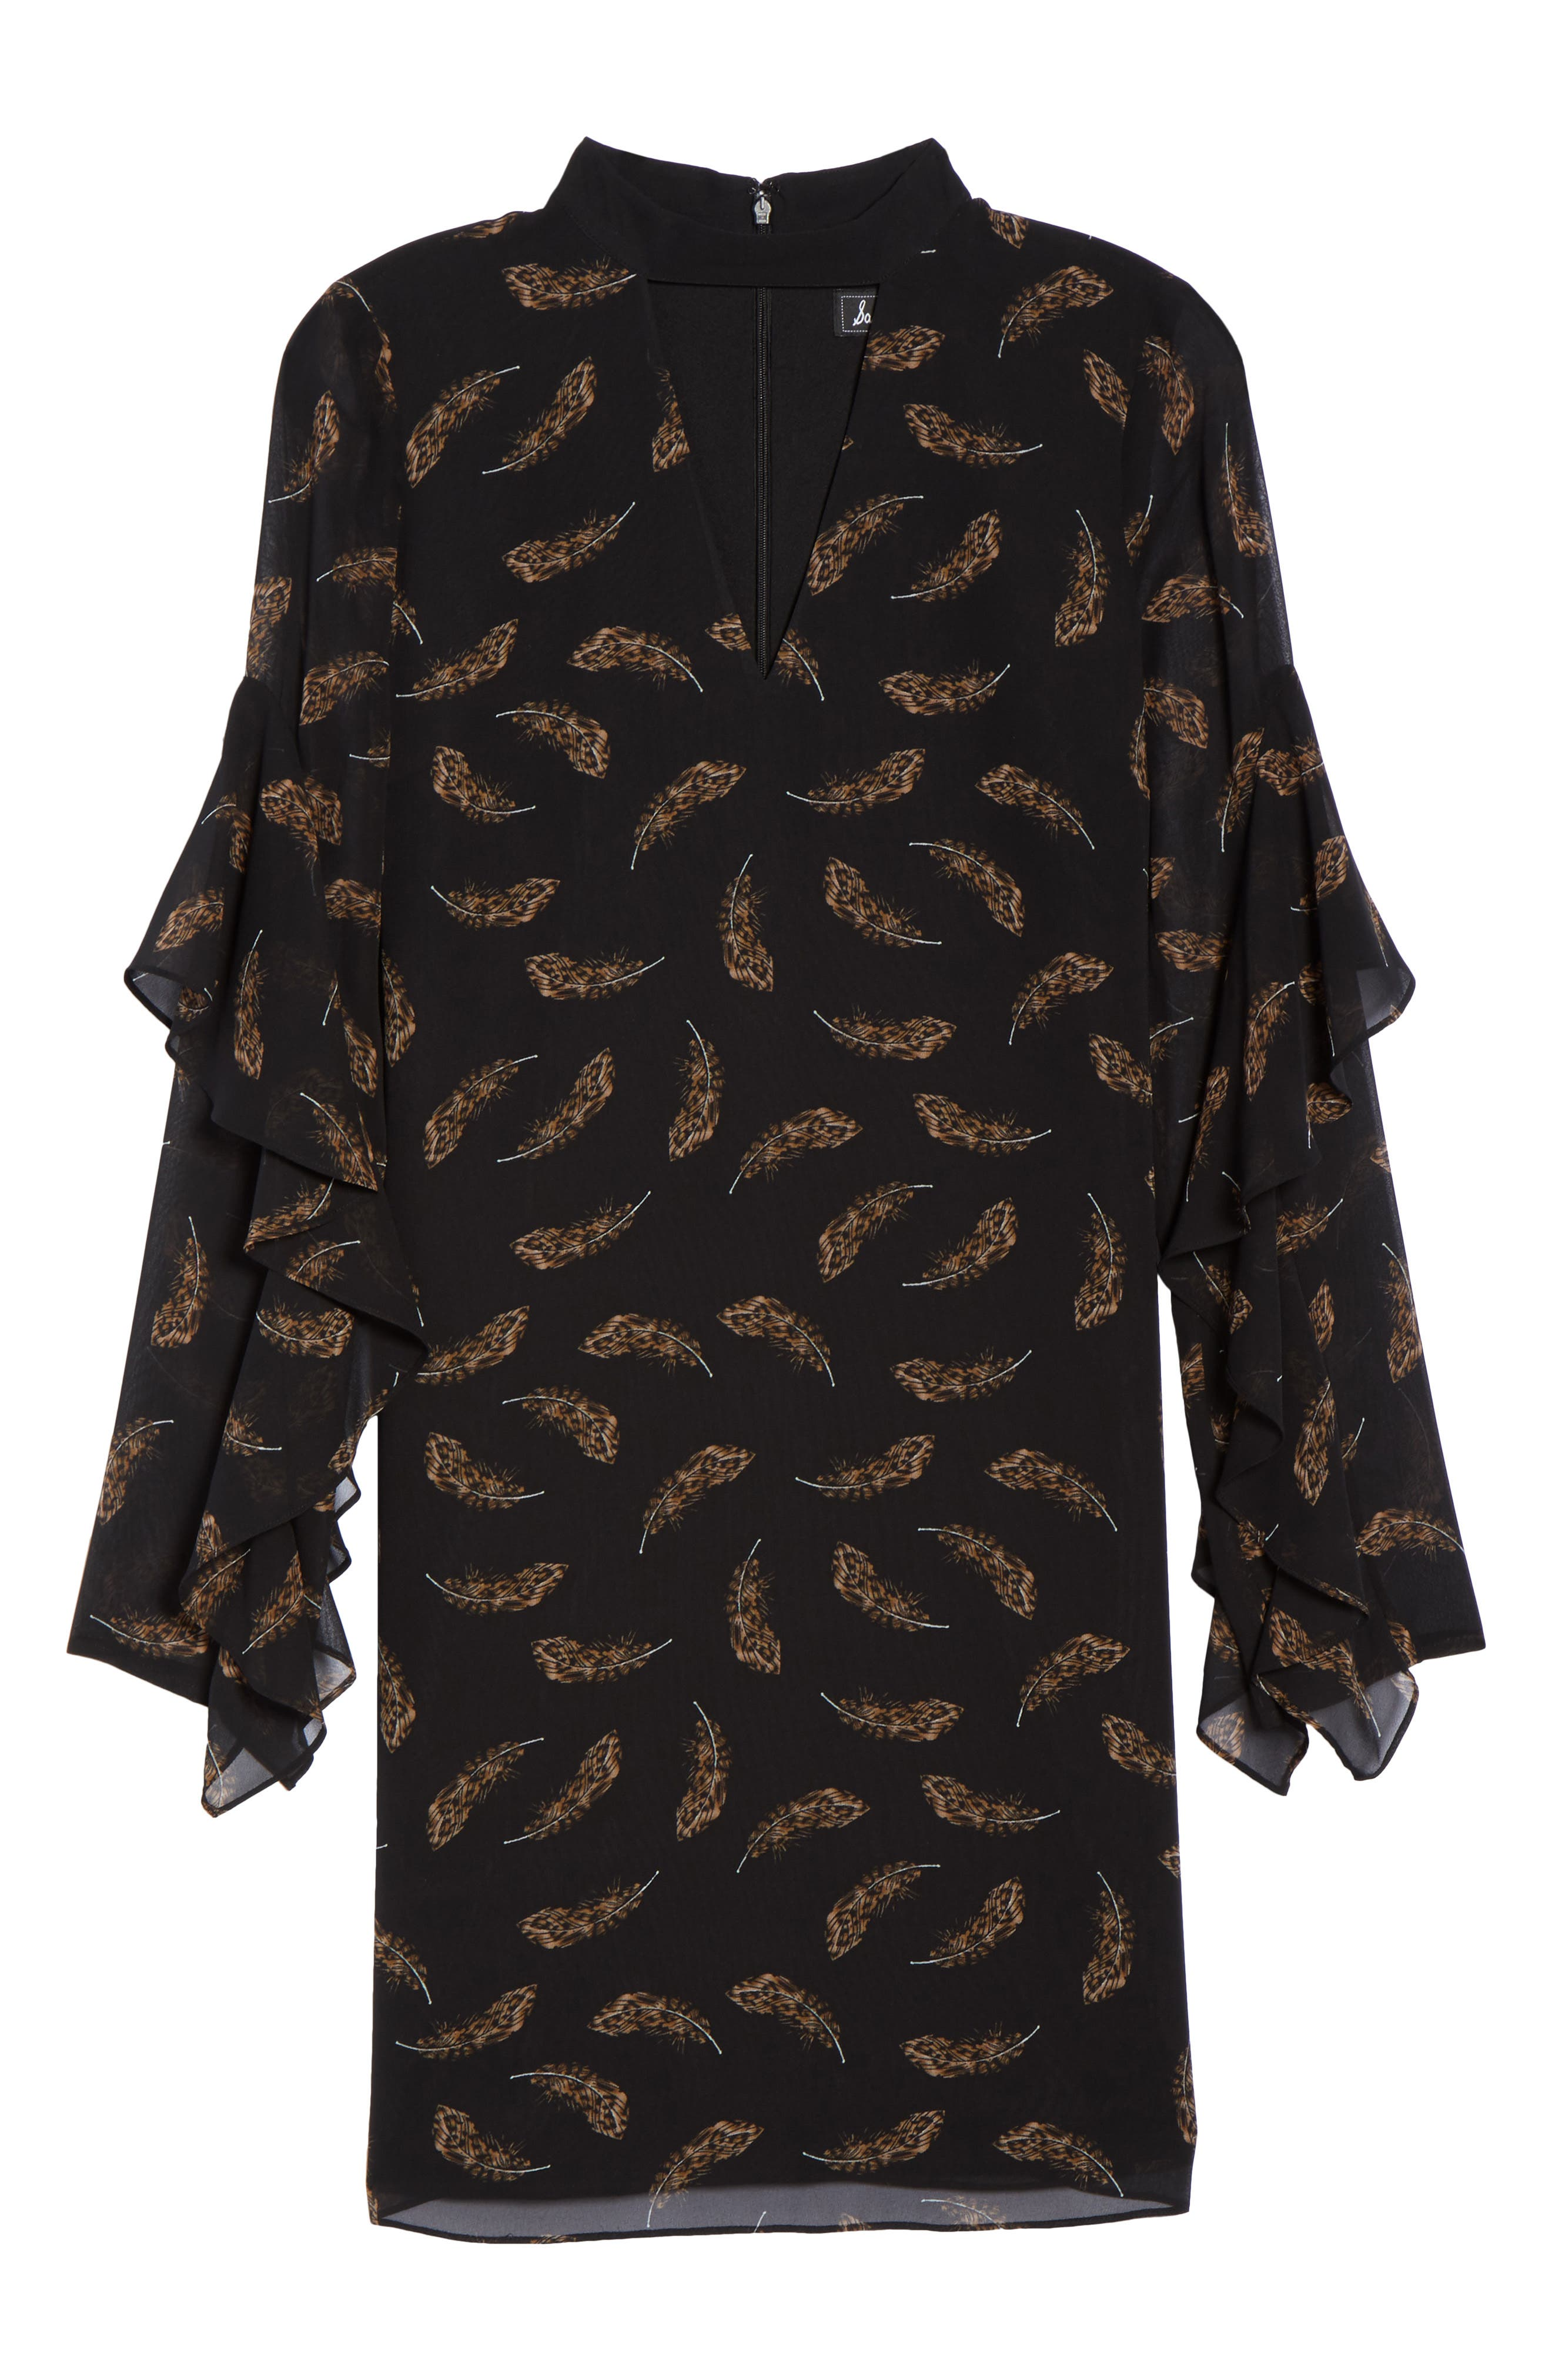 Feather Print Choker Collar Dress,                             Alternate thumbnail 6, color,                             Leopard Feather